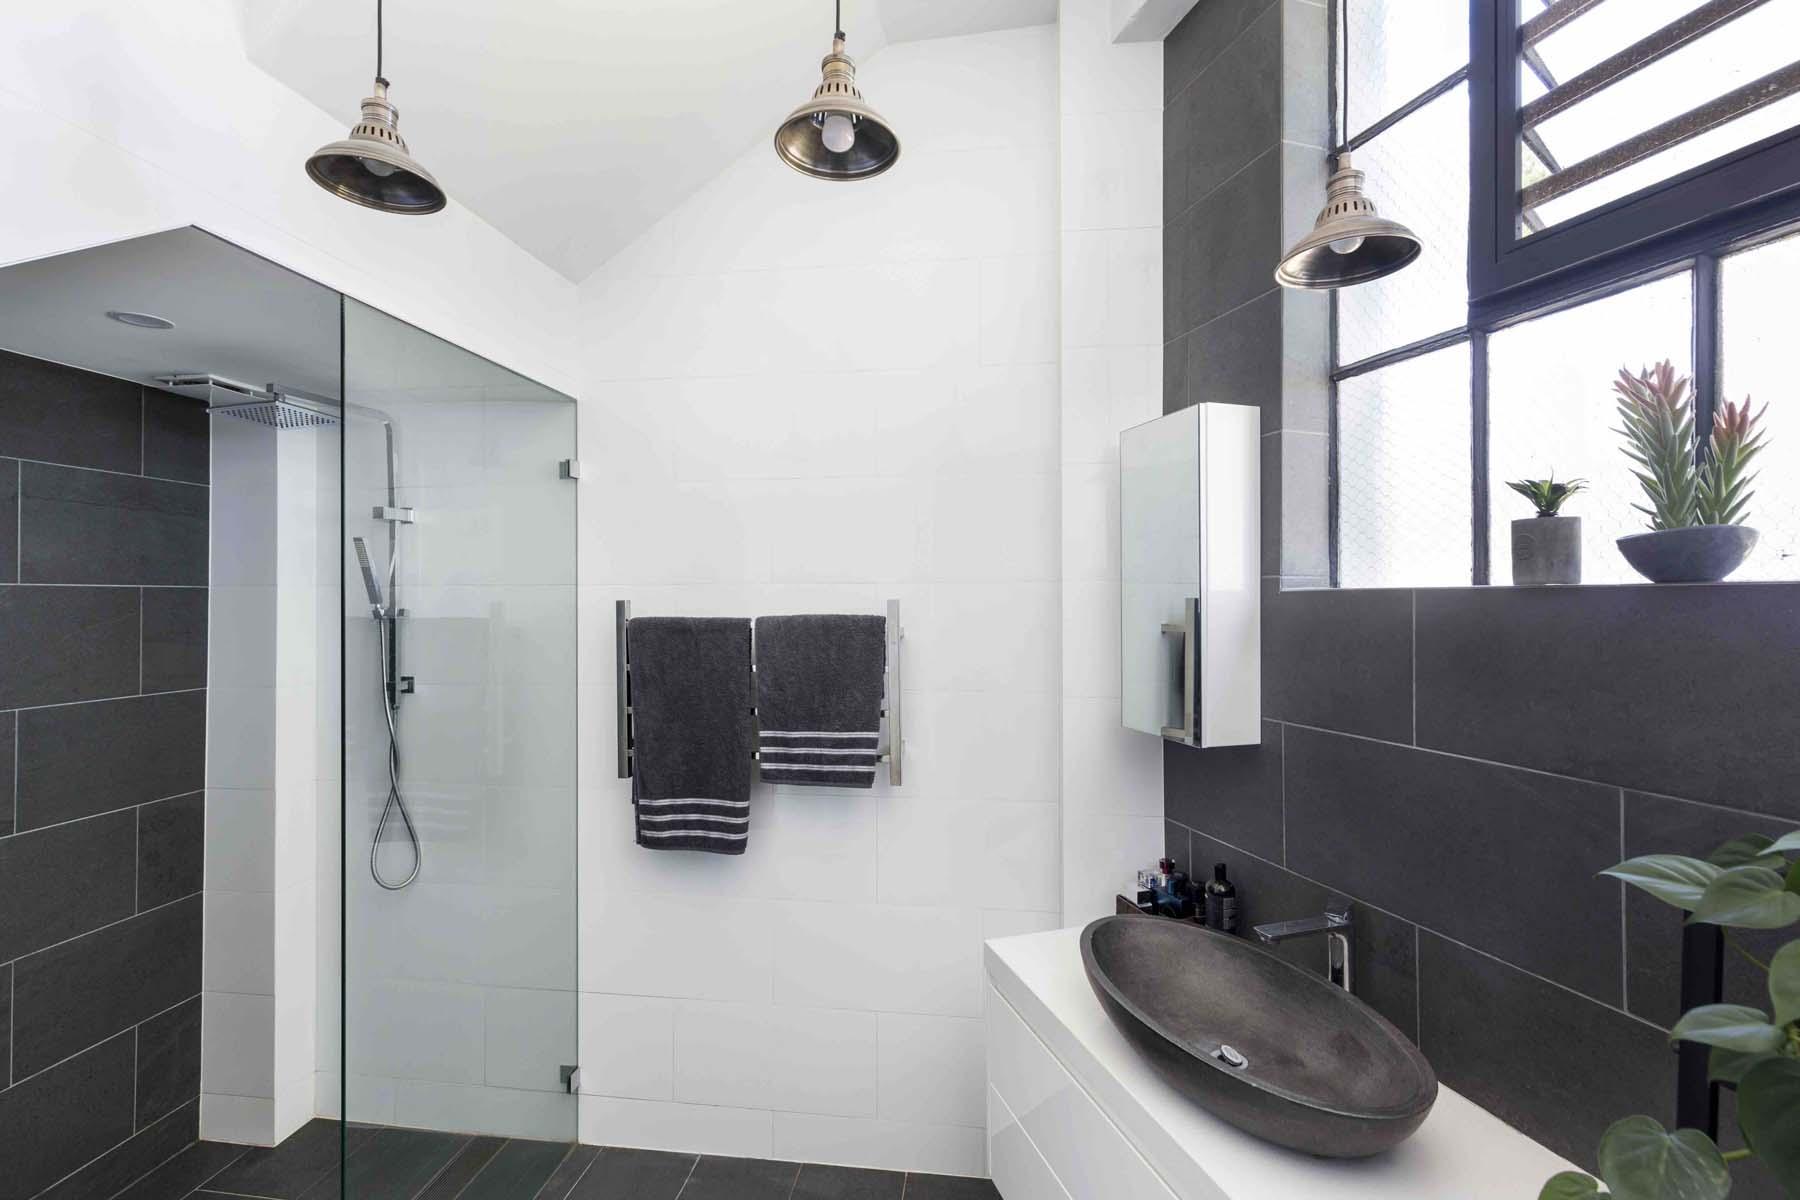 Studio bathroom copy.jpg